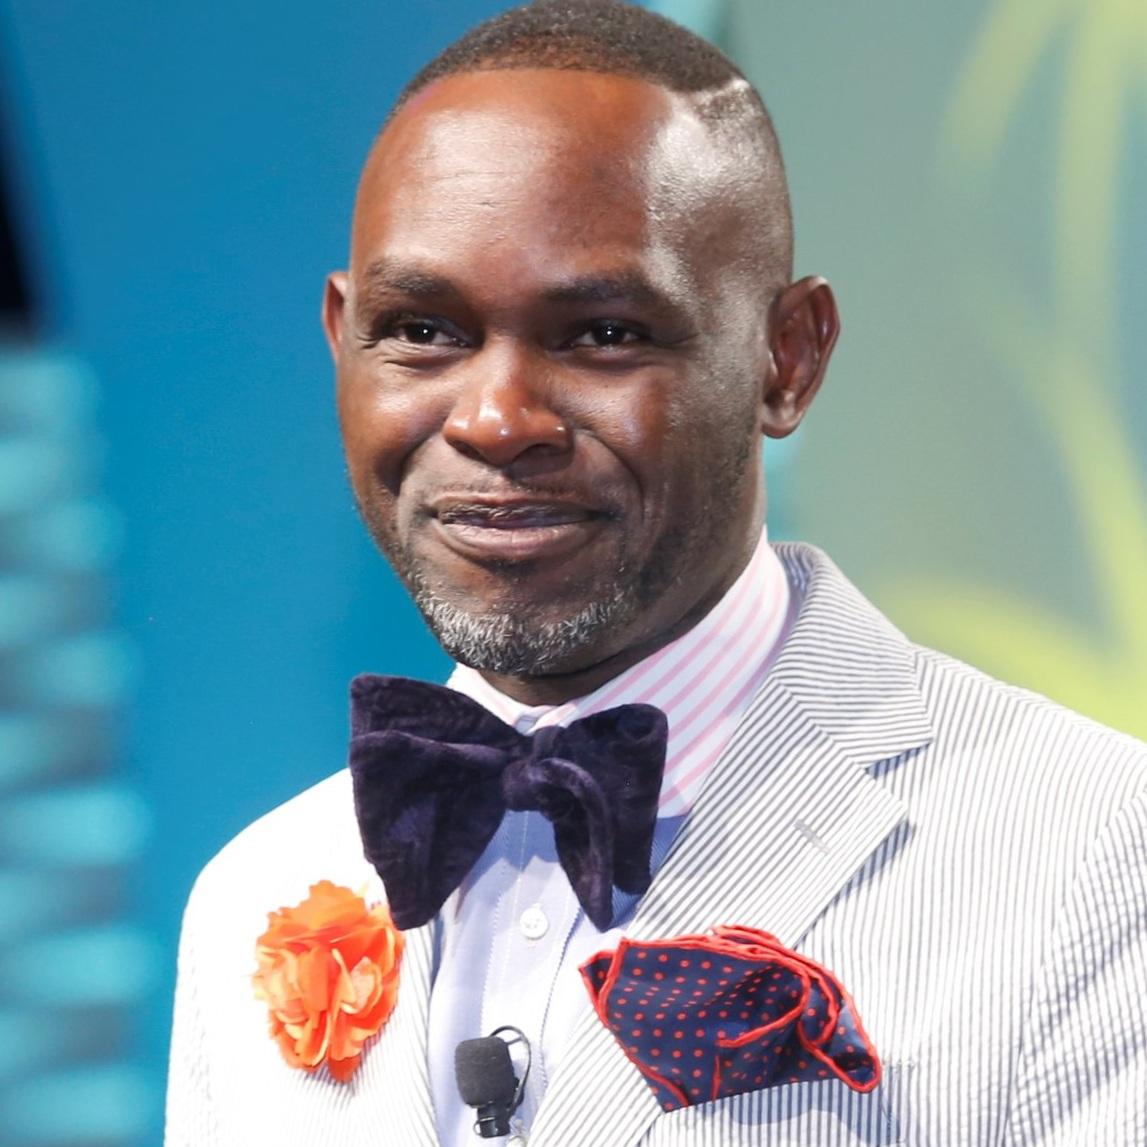 Dr. Derreck Kayongo    Founder,  Global Soap Project; CNN Hero; Social Innovator & Entrepreneur